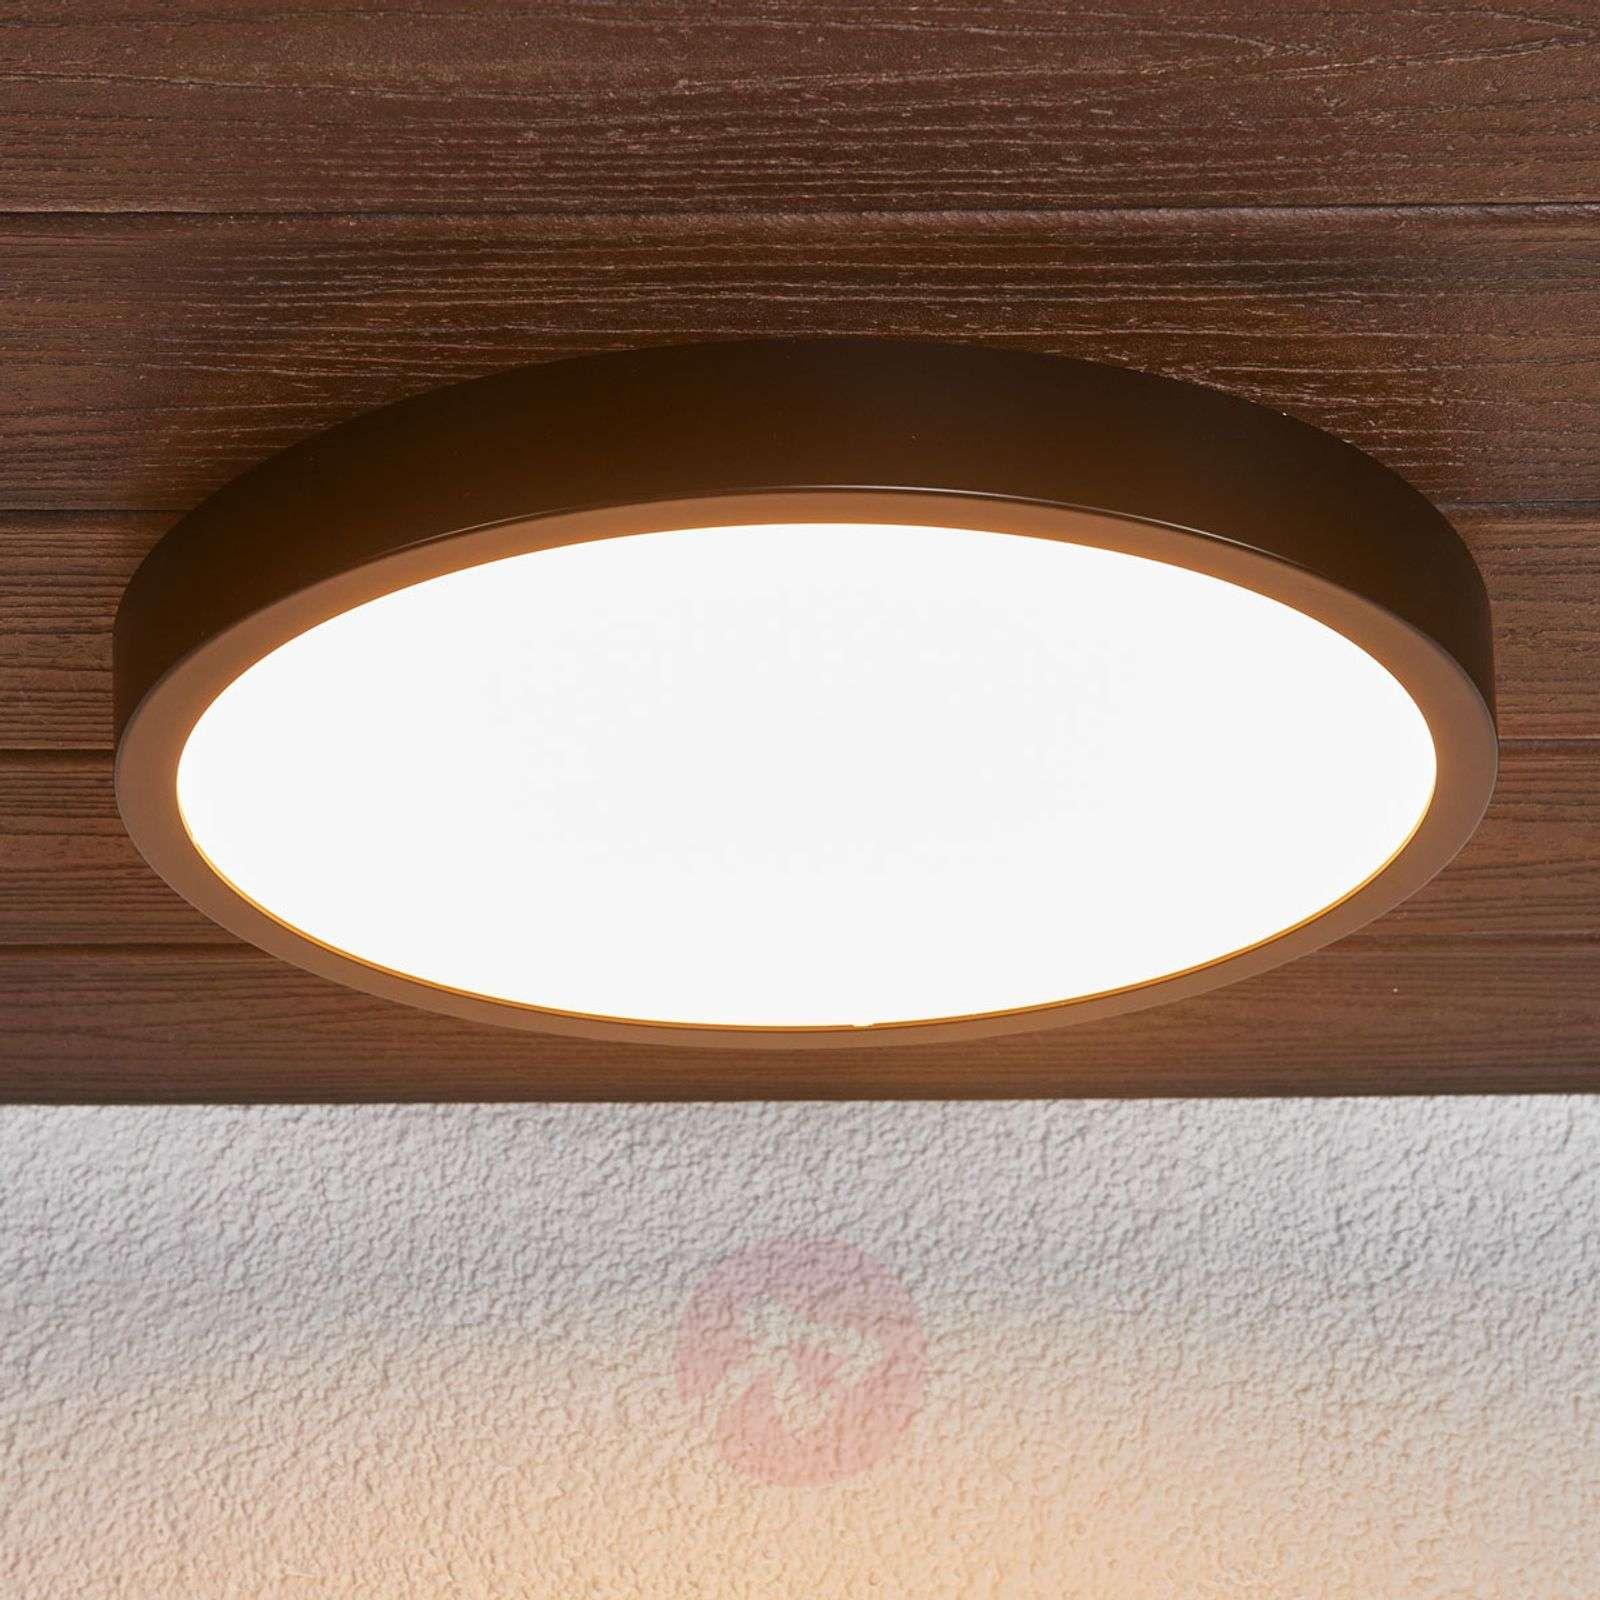 Black Liyan LED ceiling light, IP54-9945195-01